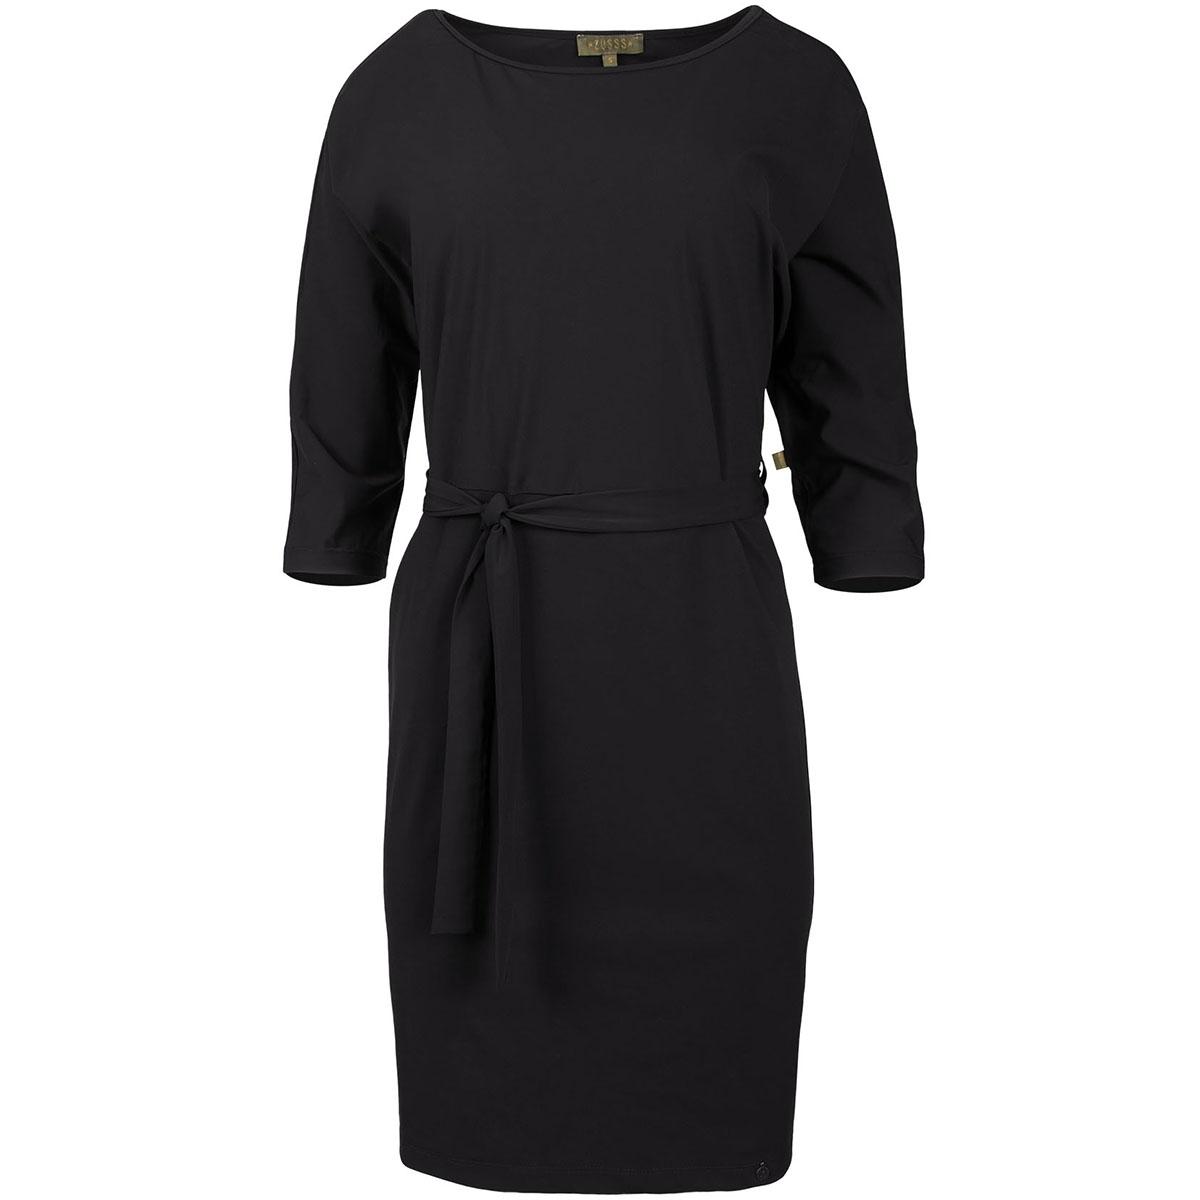 03sj18n zusss jurk azw zwart